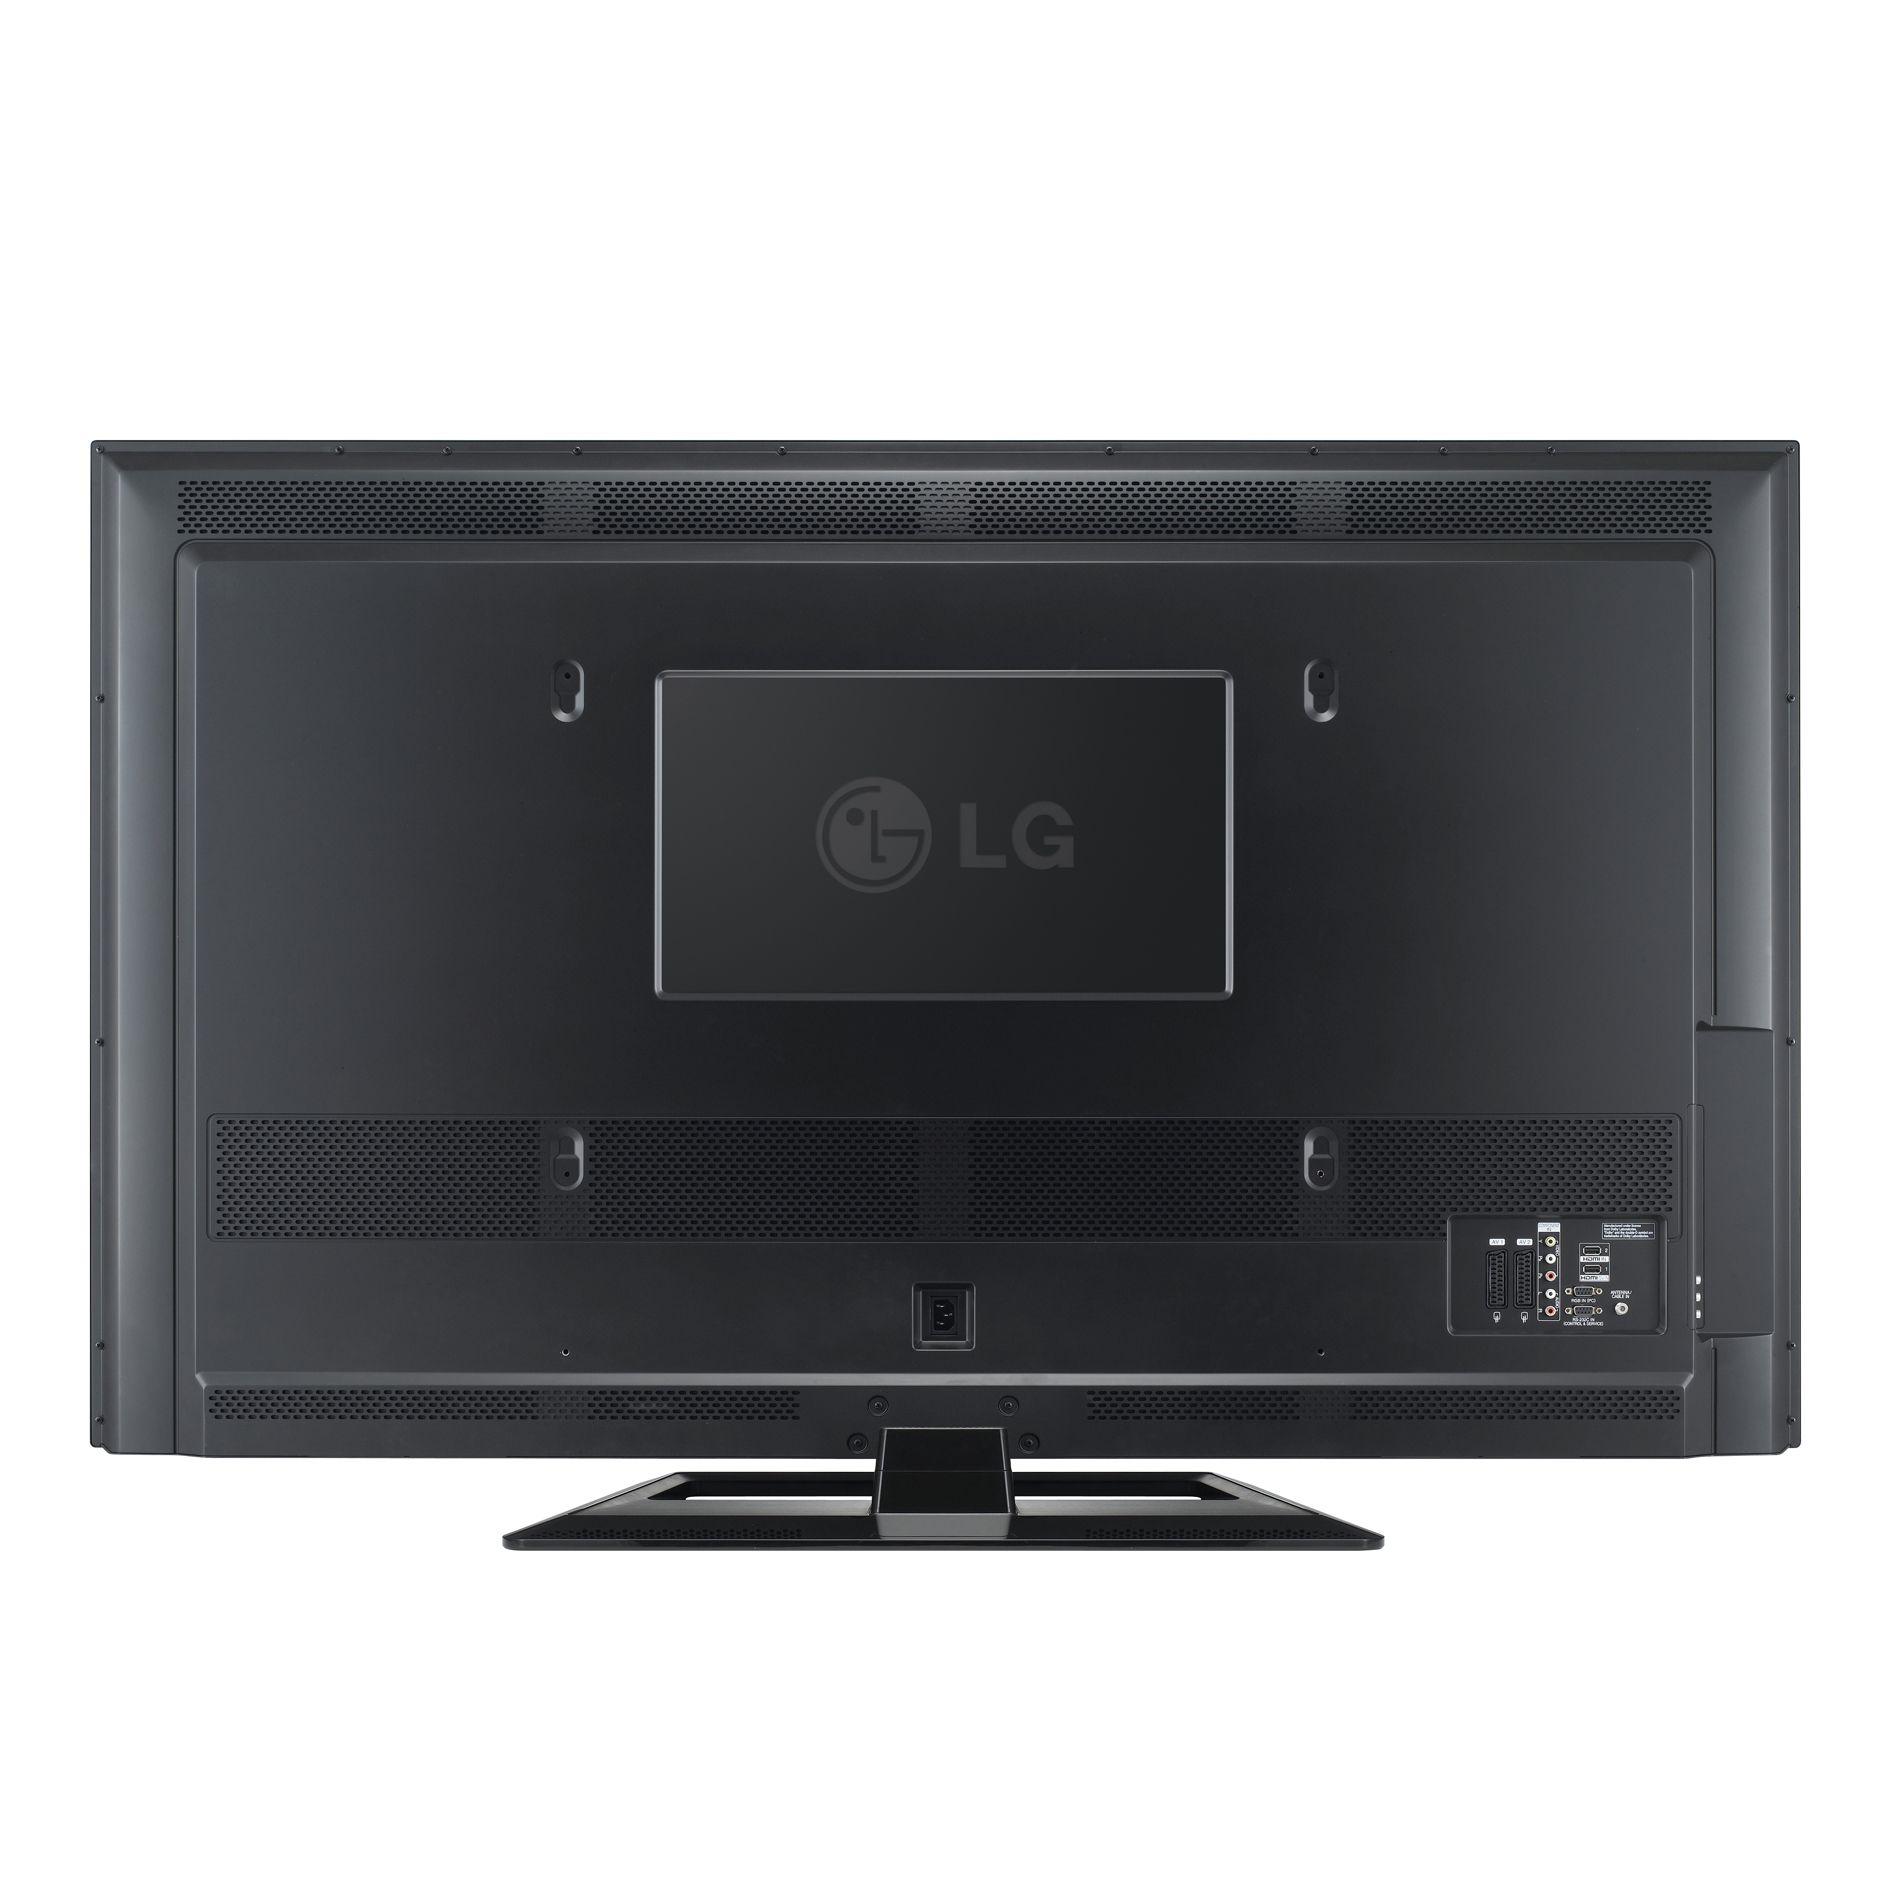 "LG 50"" Class 1080p 600Hz Plasma HDTV - 50PA5500"